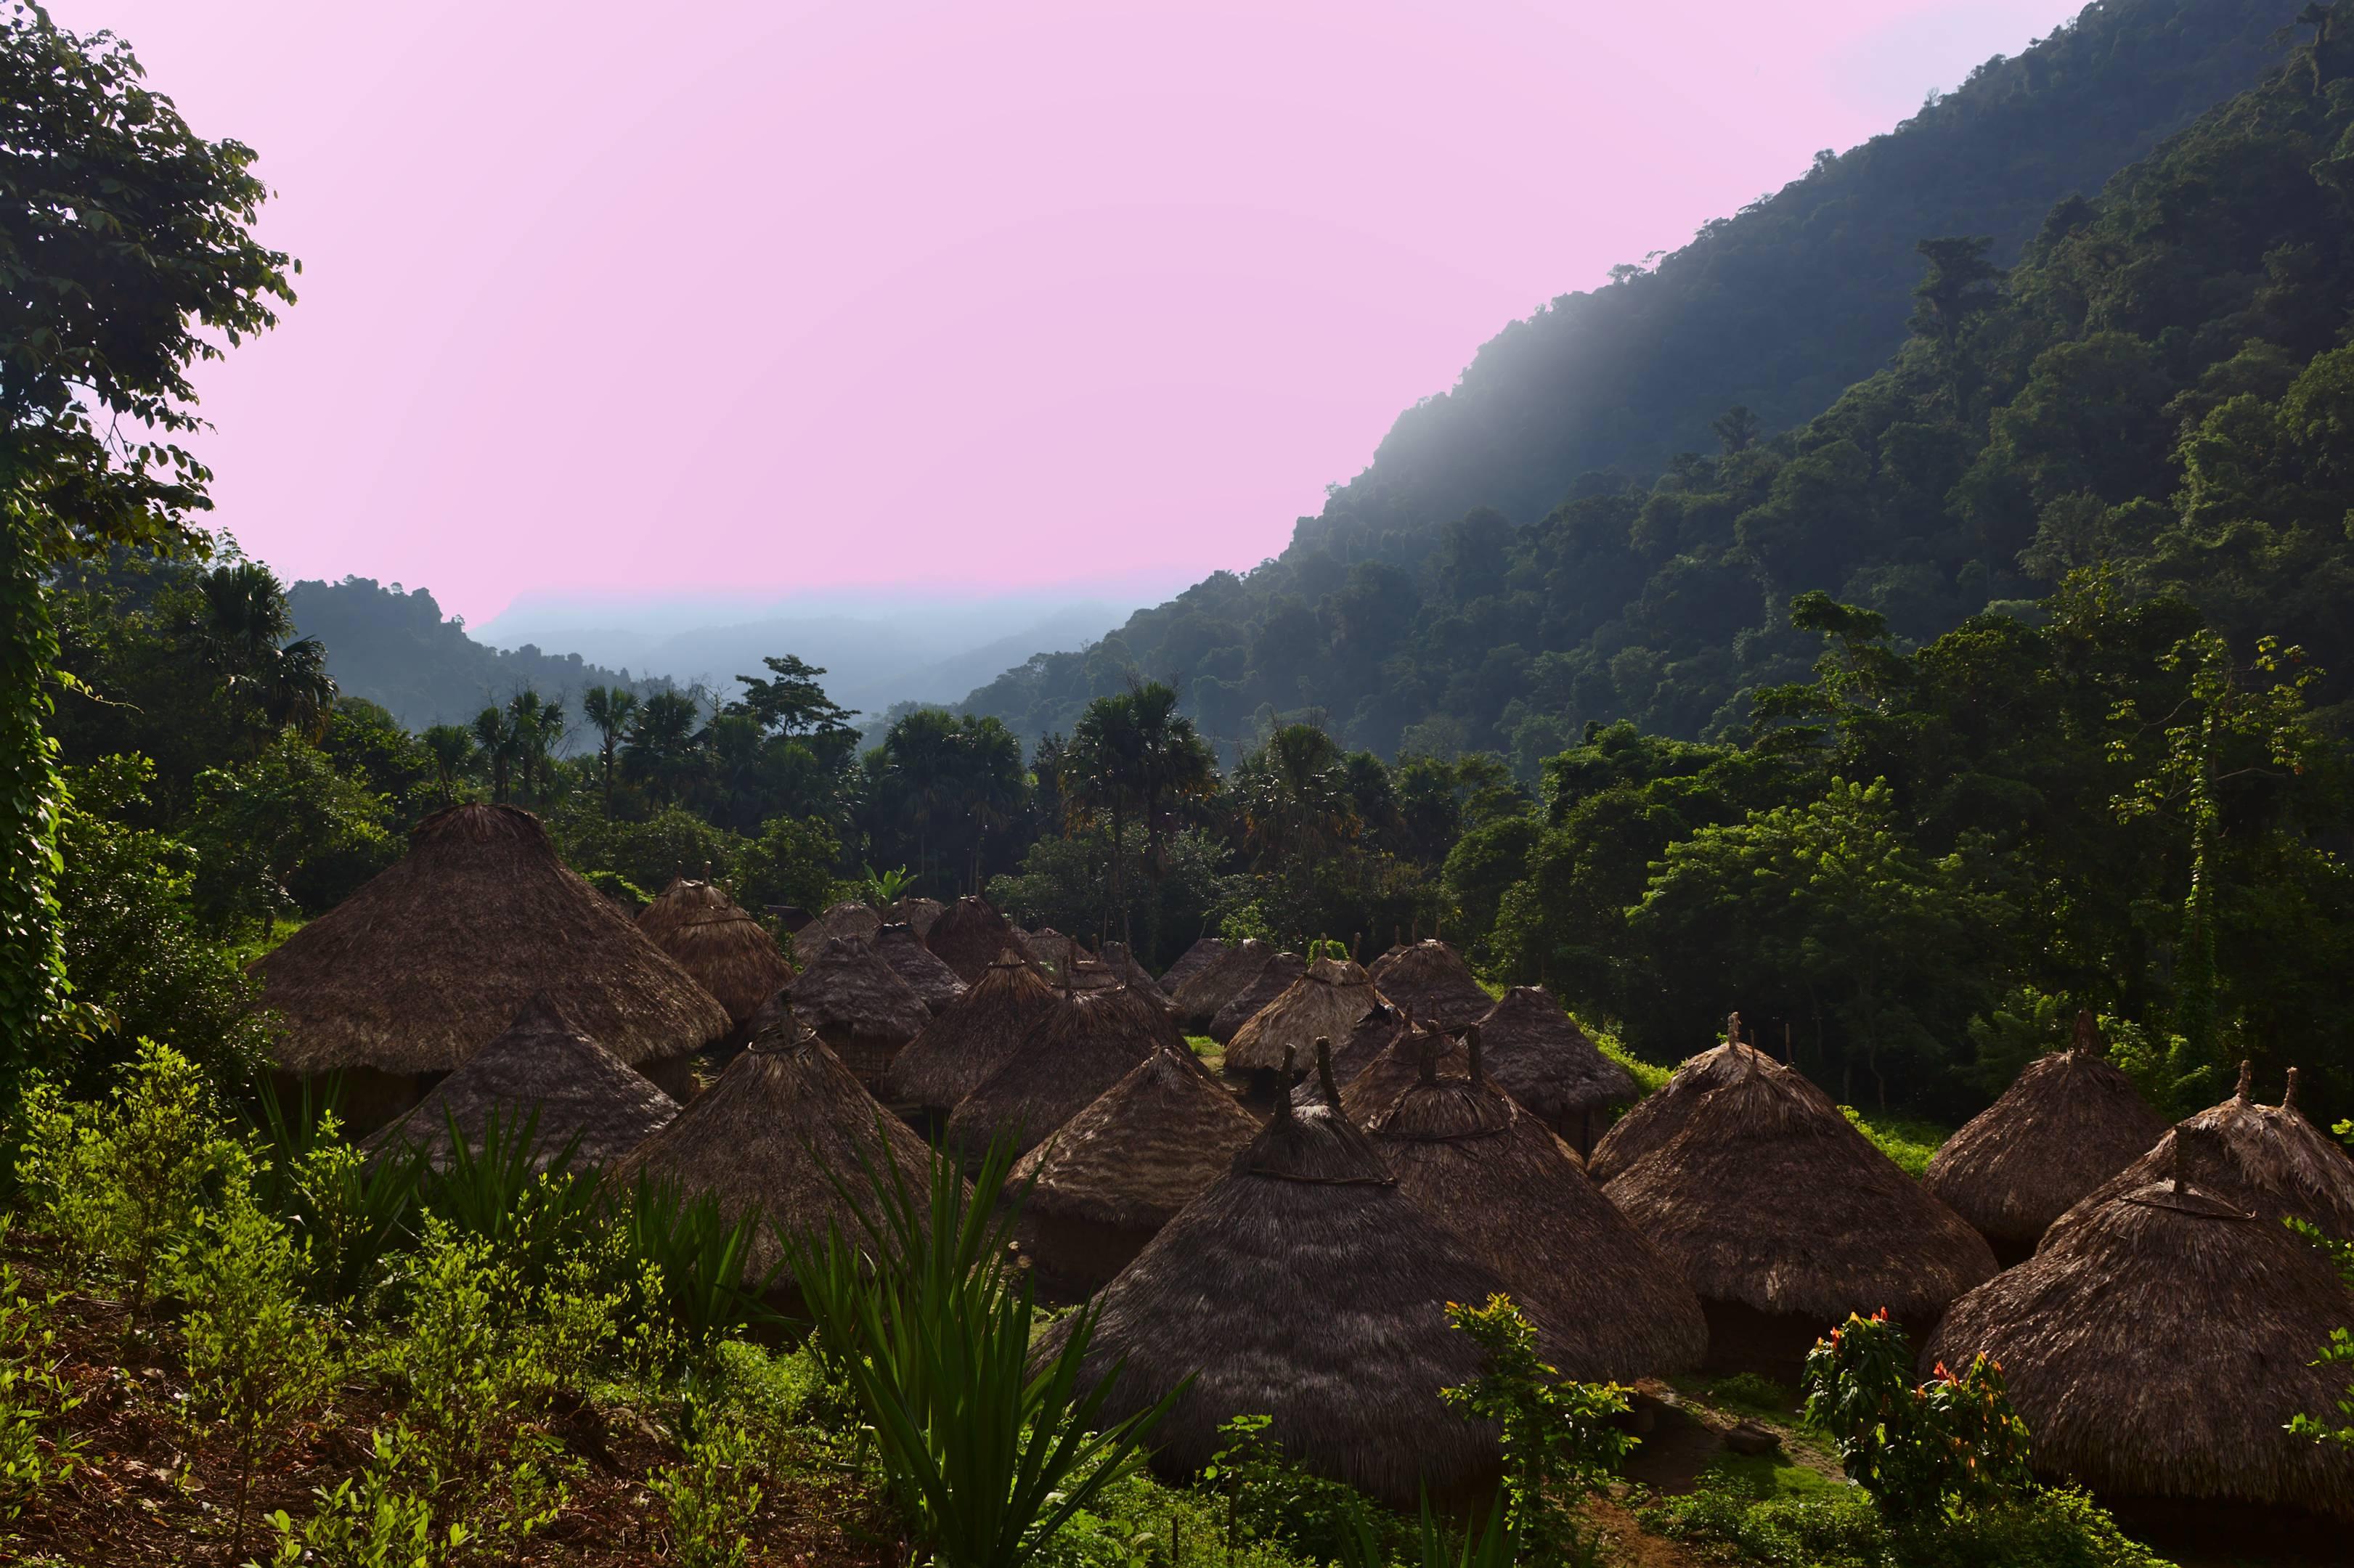 Kogi Village on the 1st day